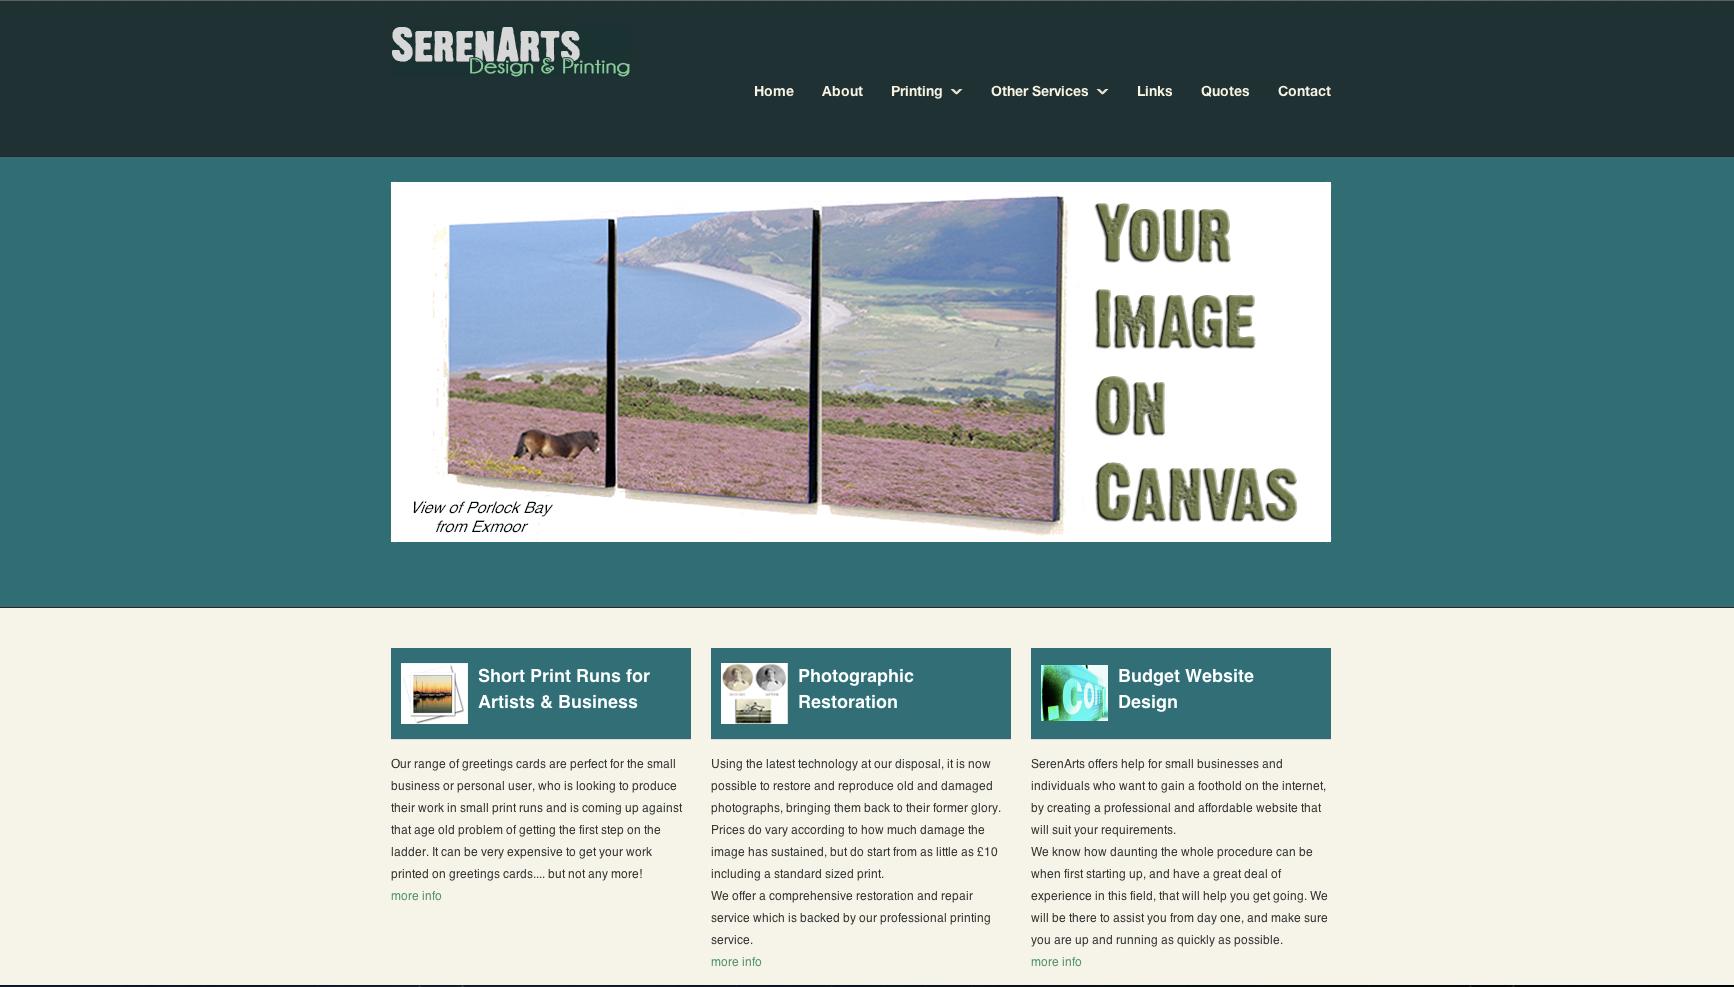 www.serenarts.co.uk